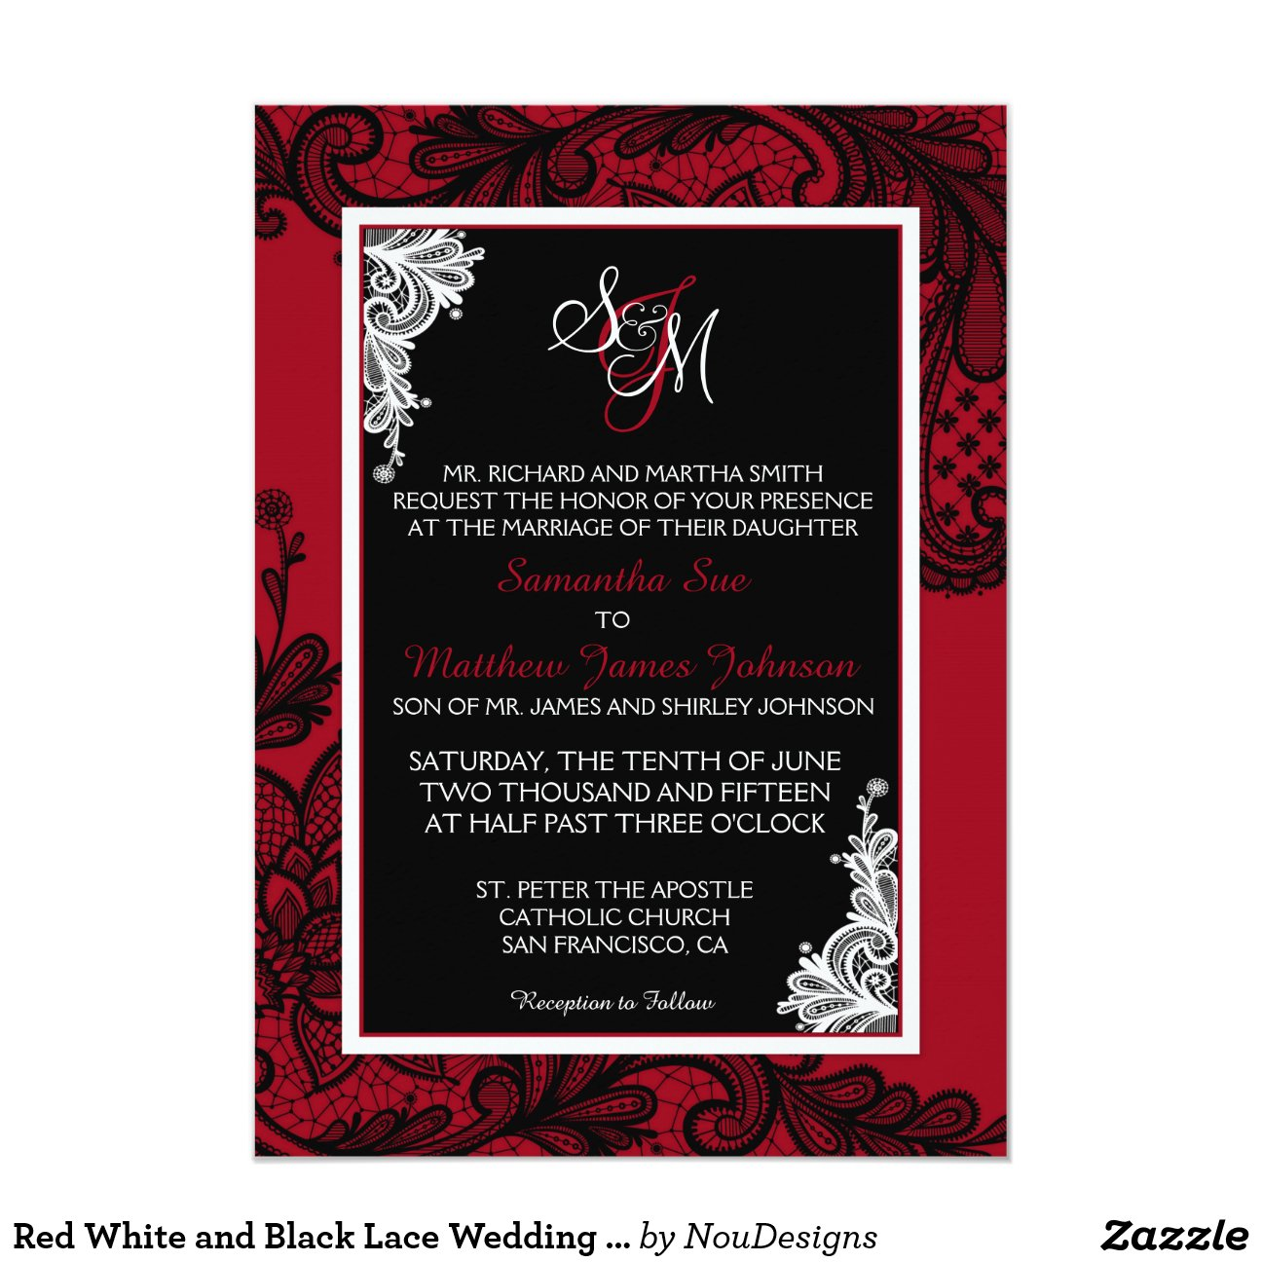 Black White Red Wedding Invitations - Menshealtharts